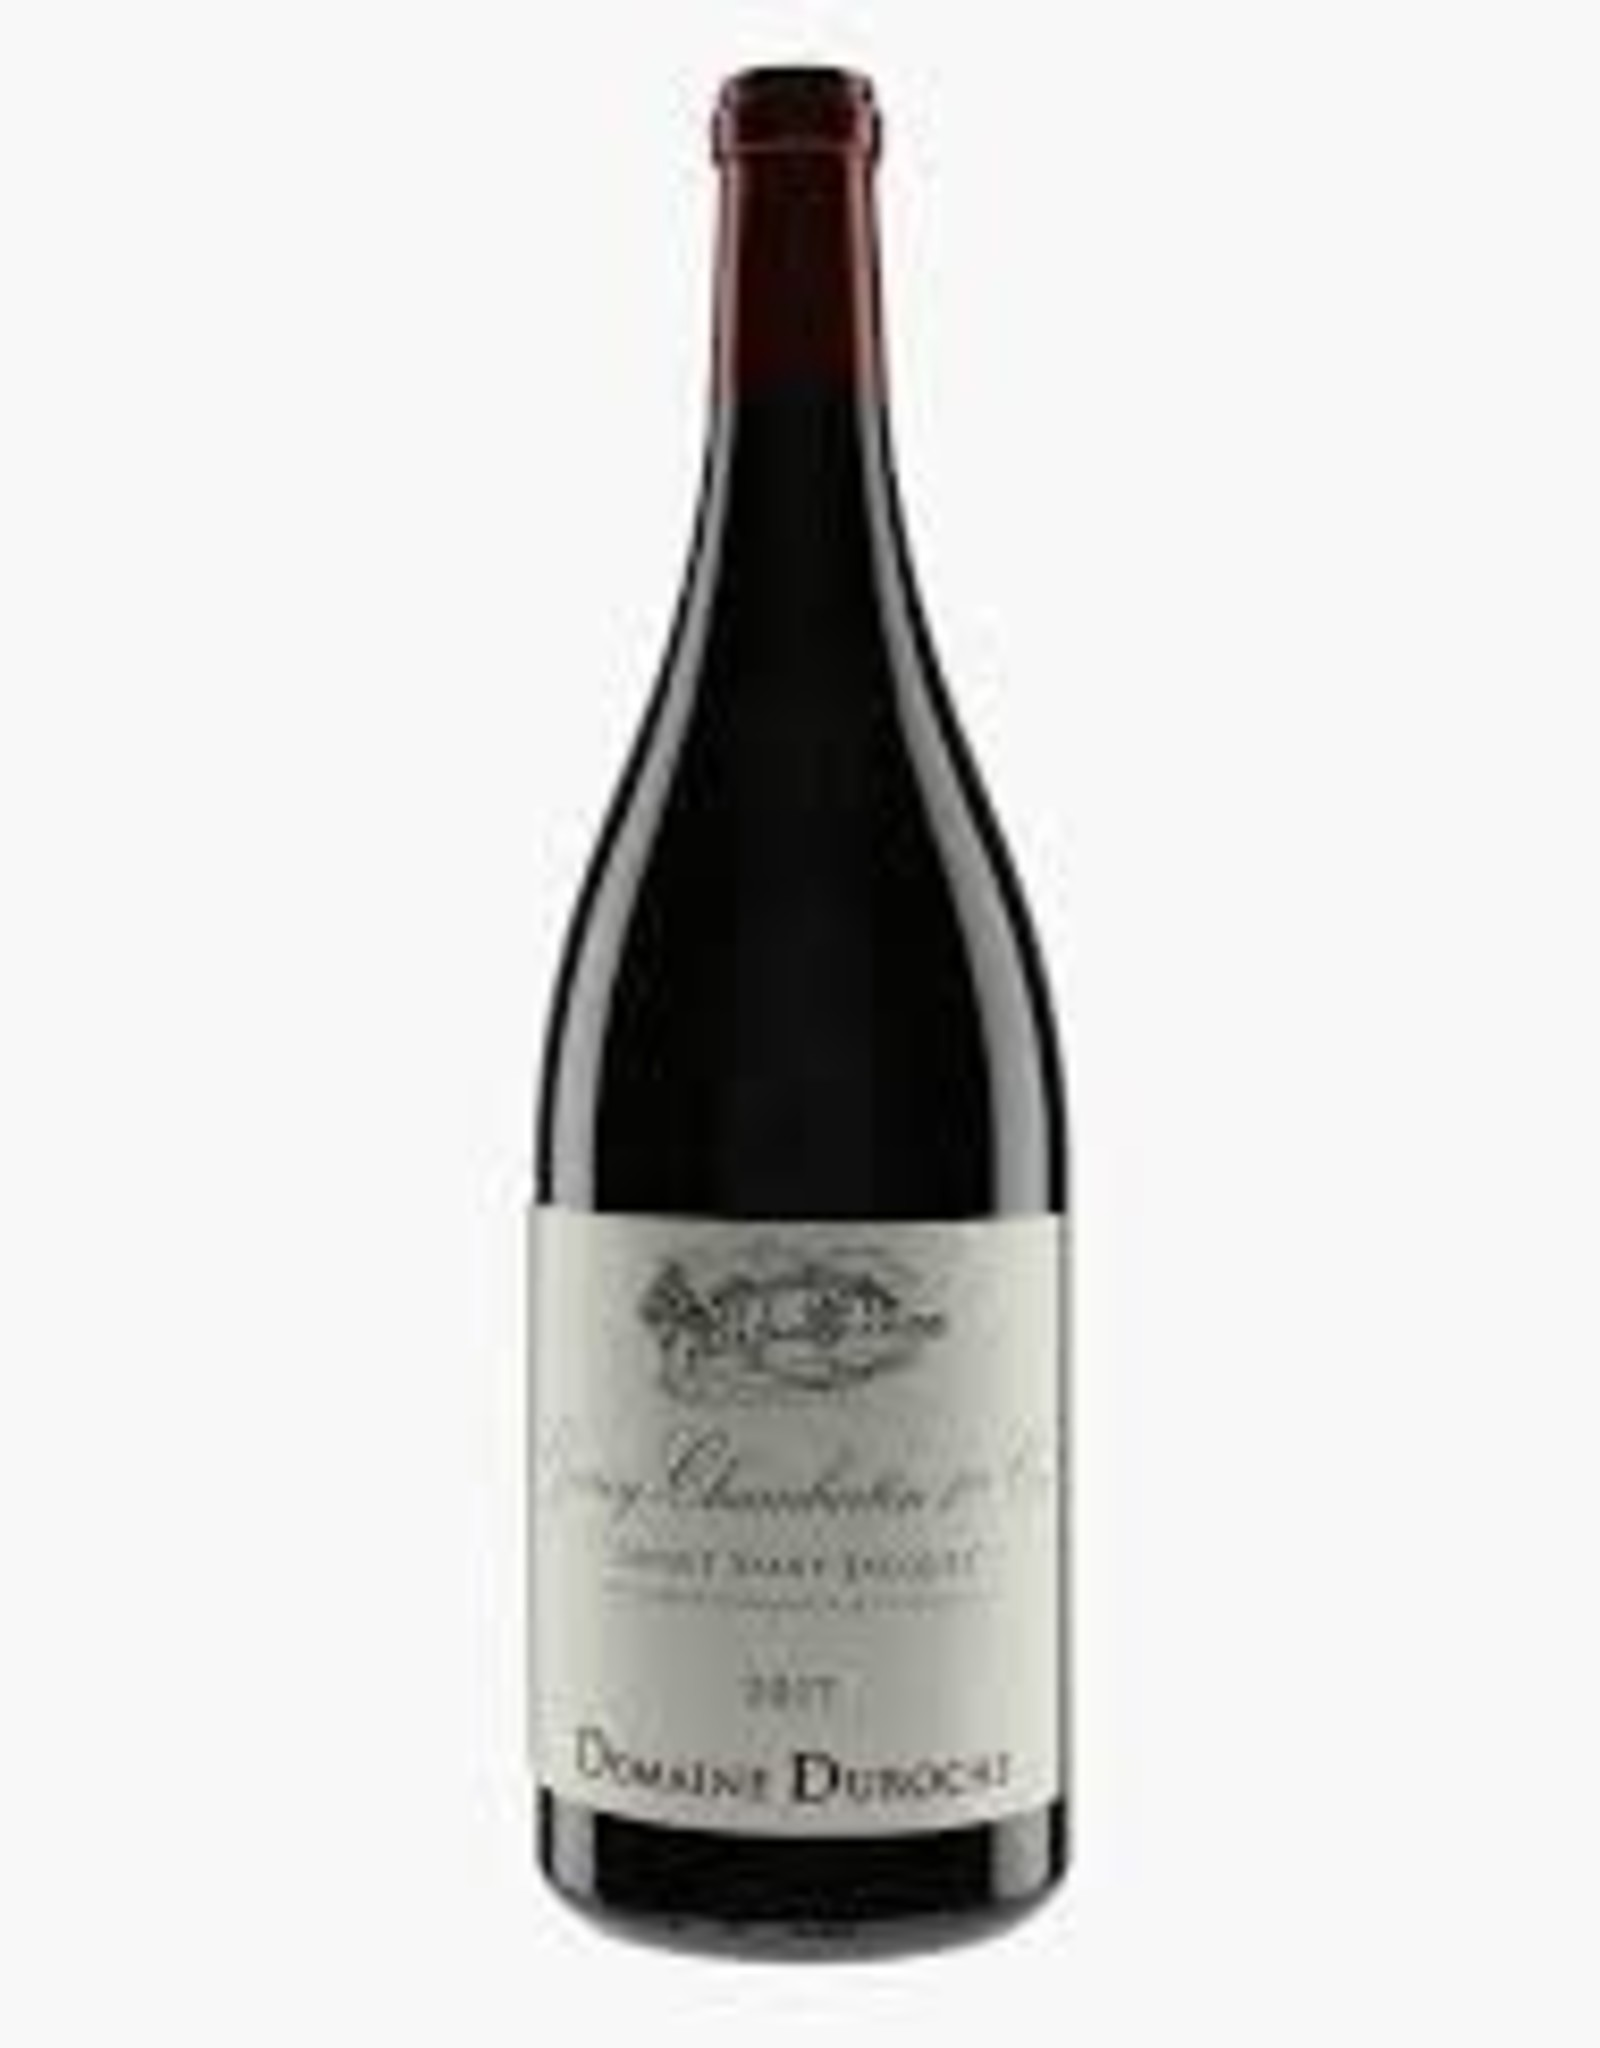 R Burgundy, 1er Lavaut Saint Jacques Gevrey-Chambertin, Duroche 2017